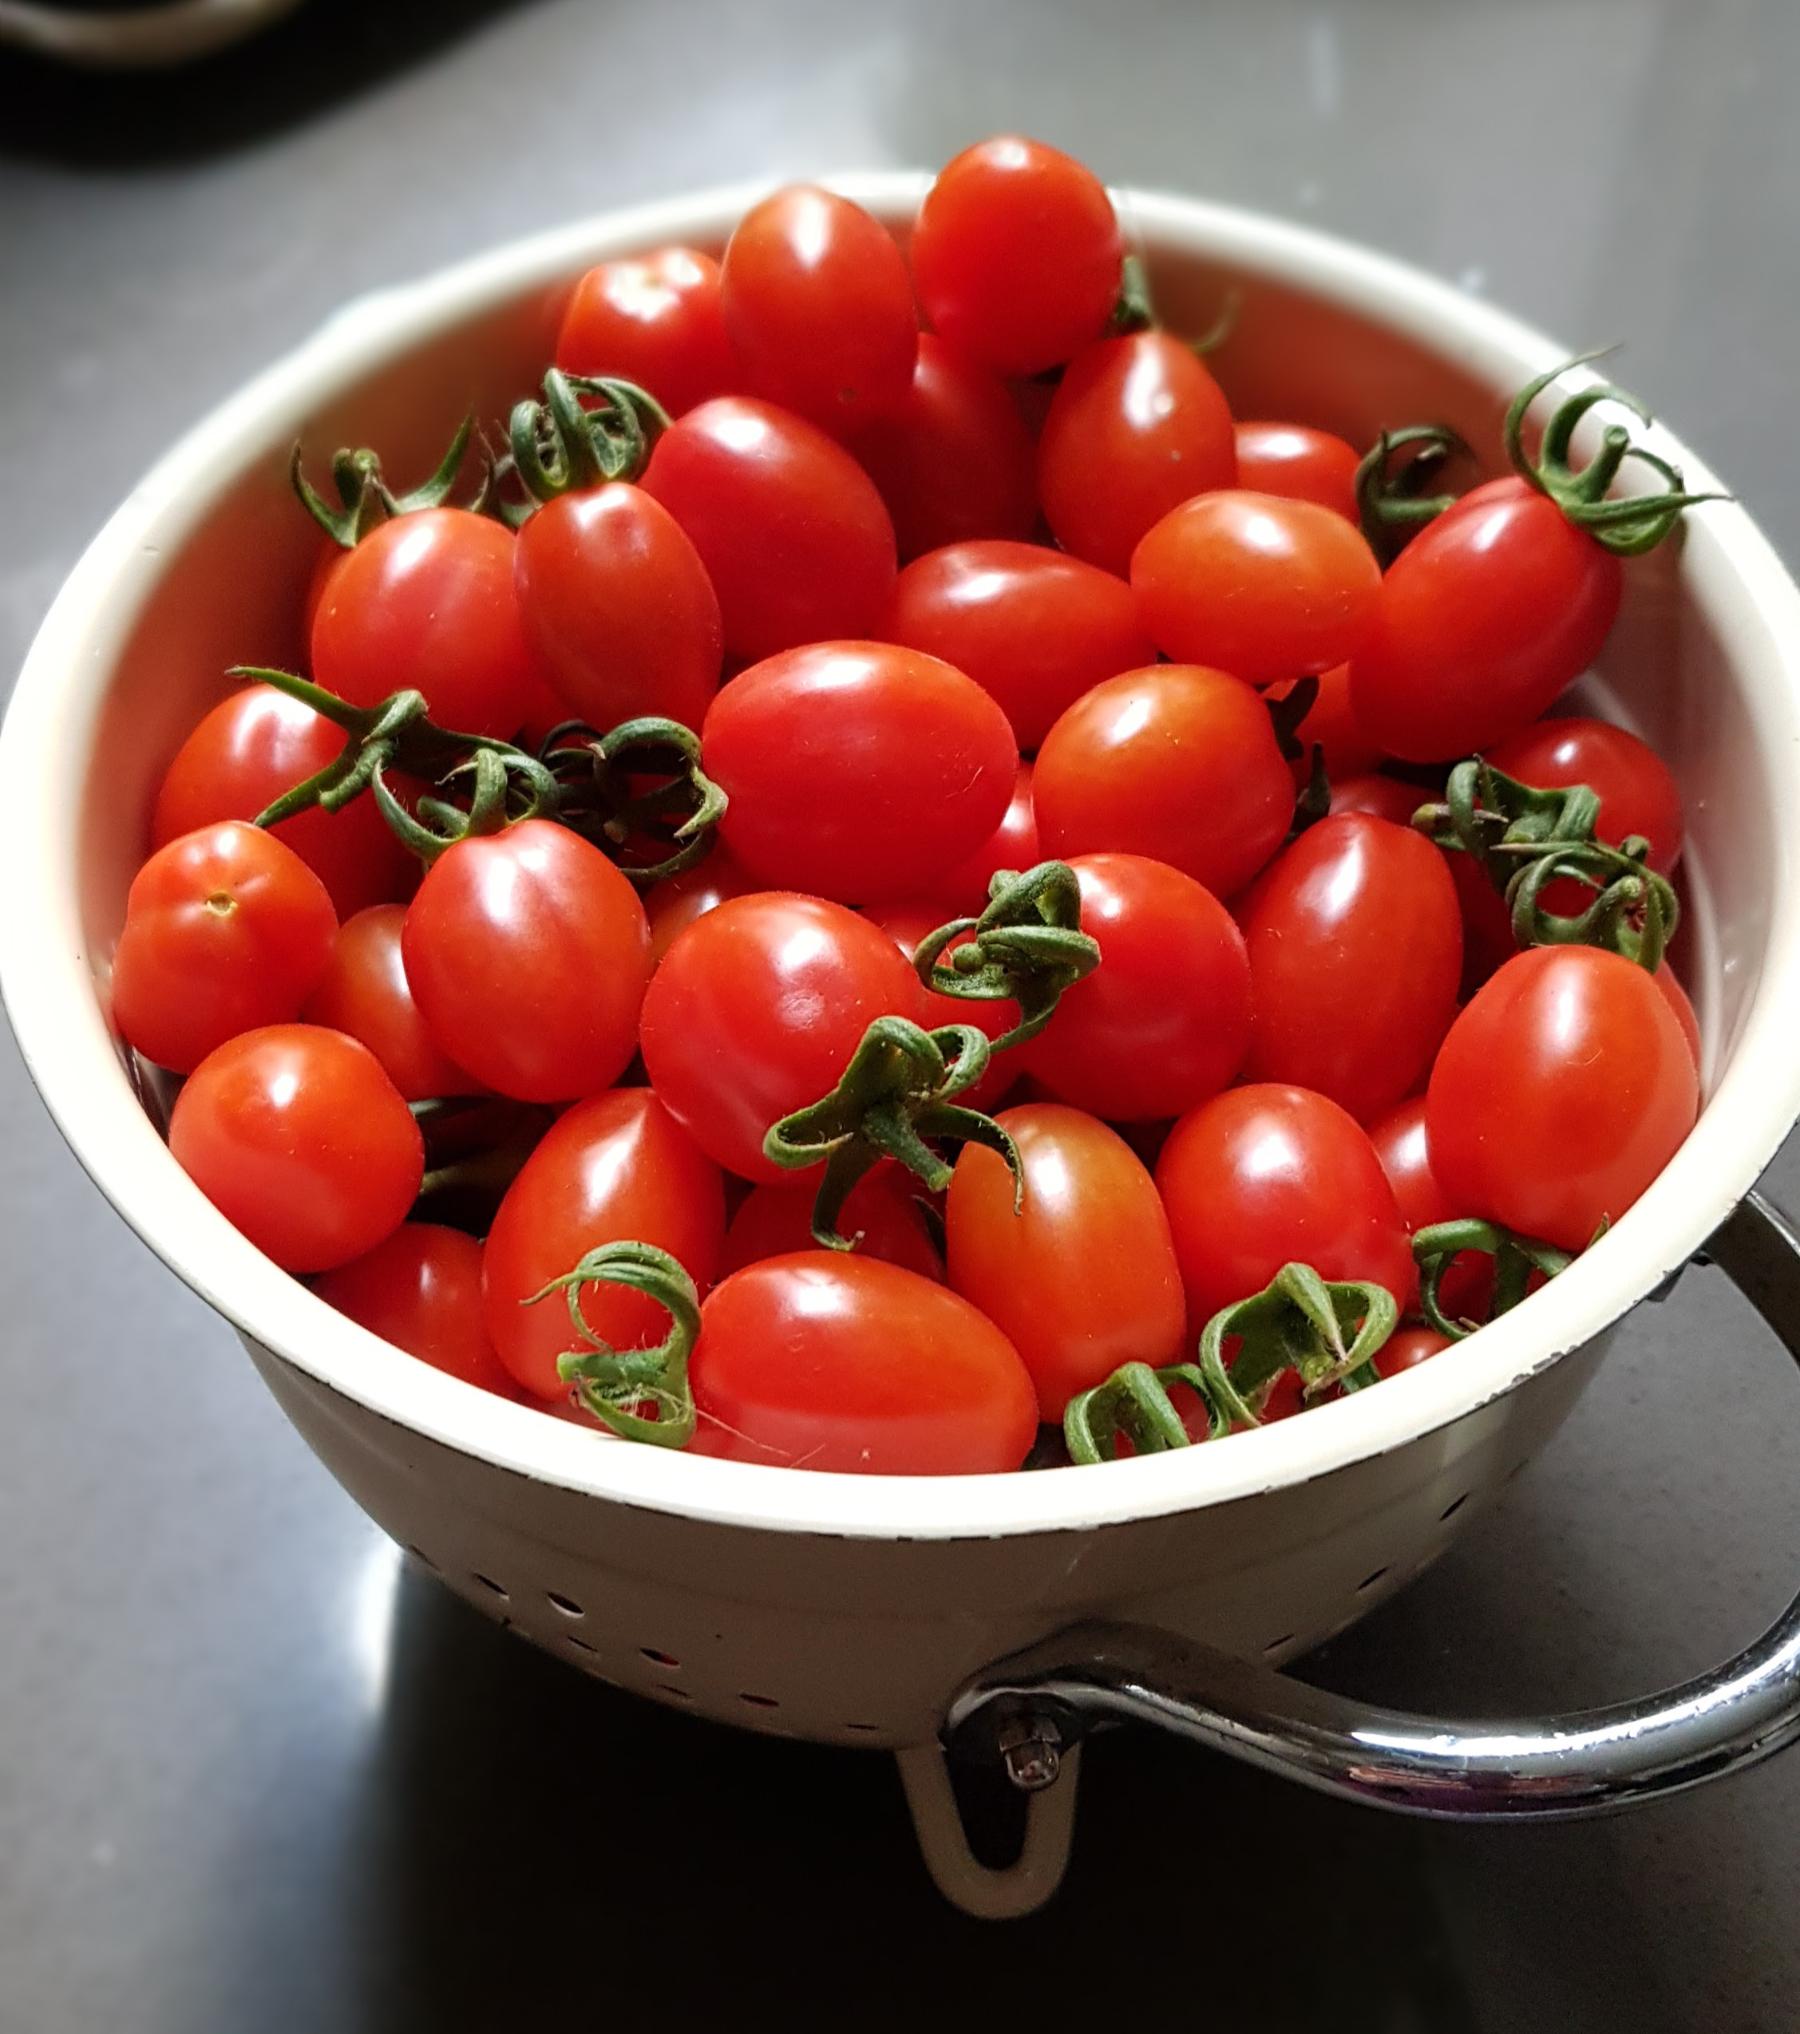 Romello tomatoes